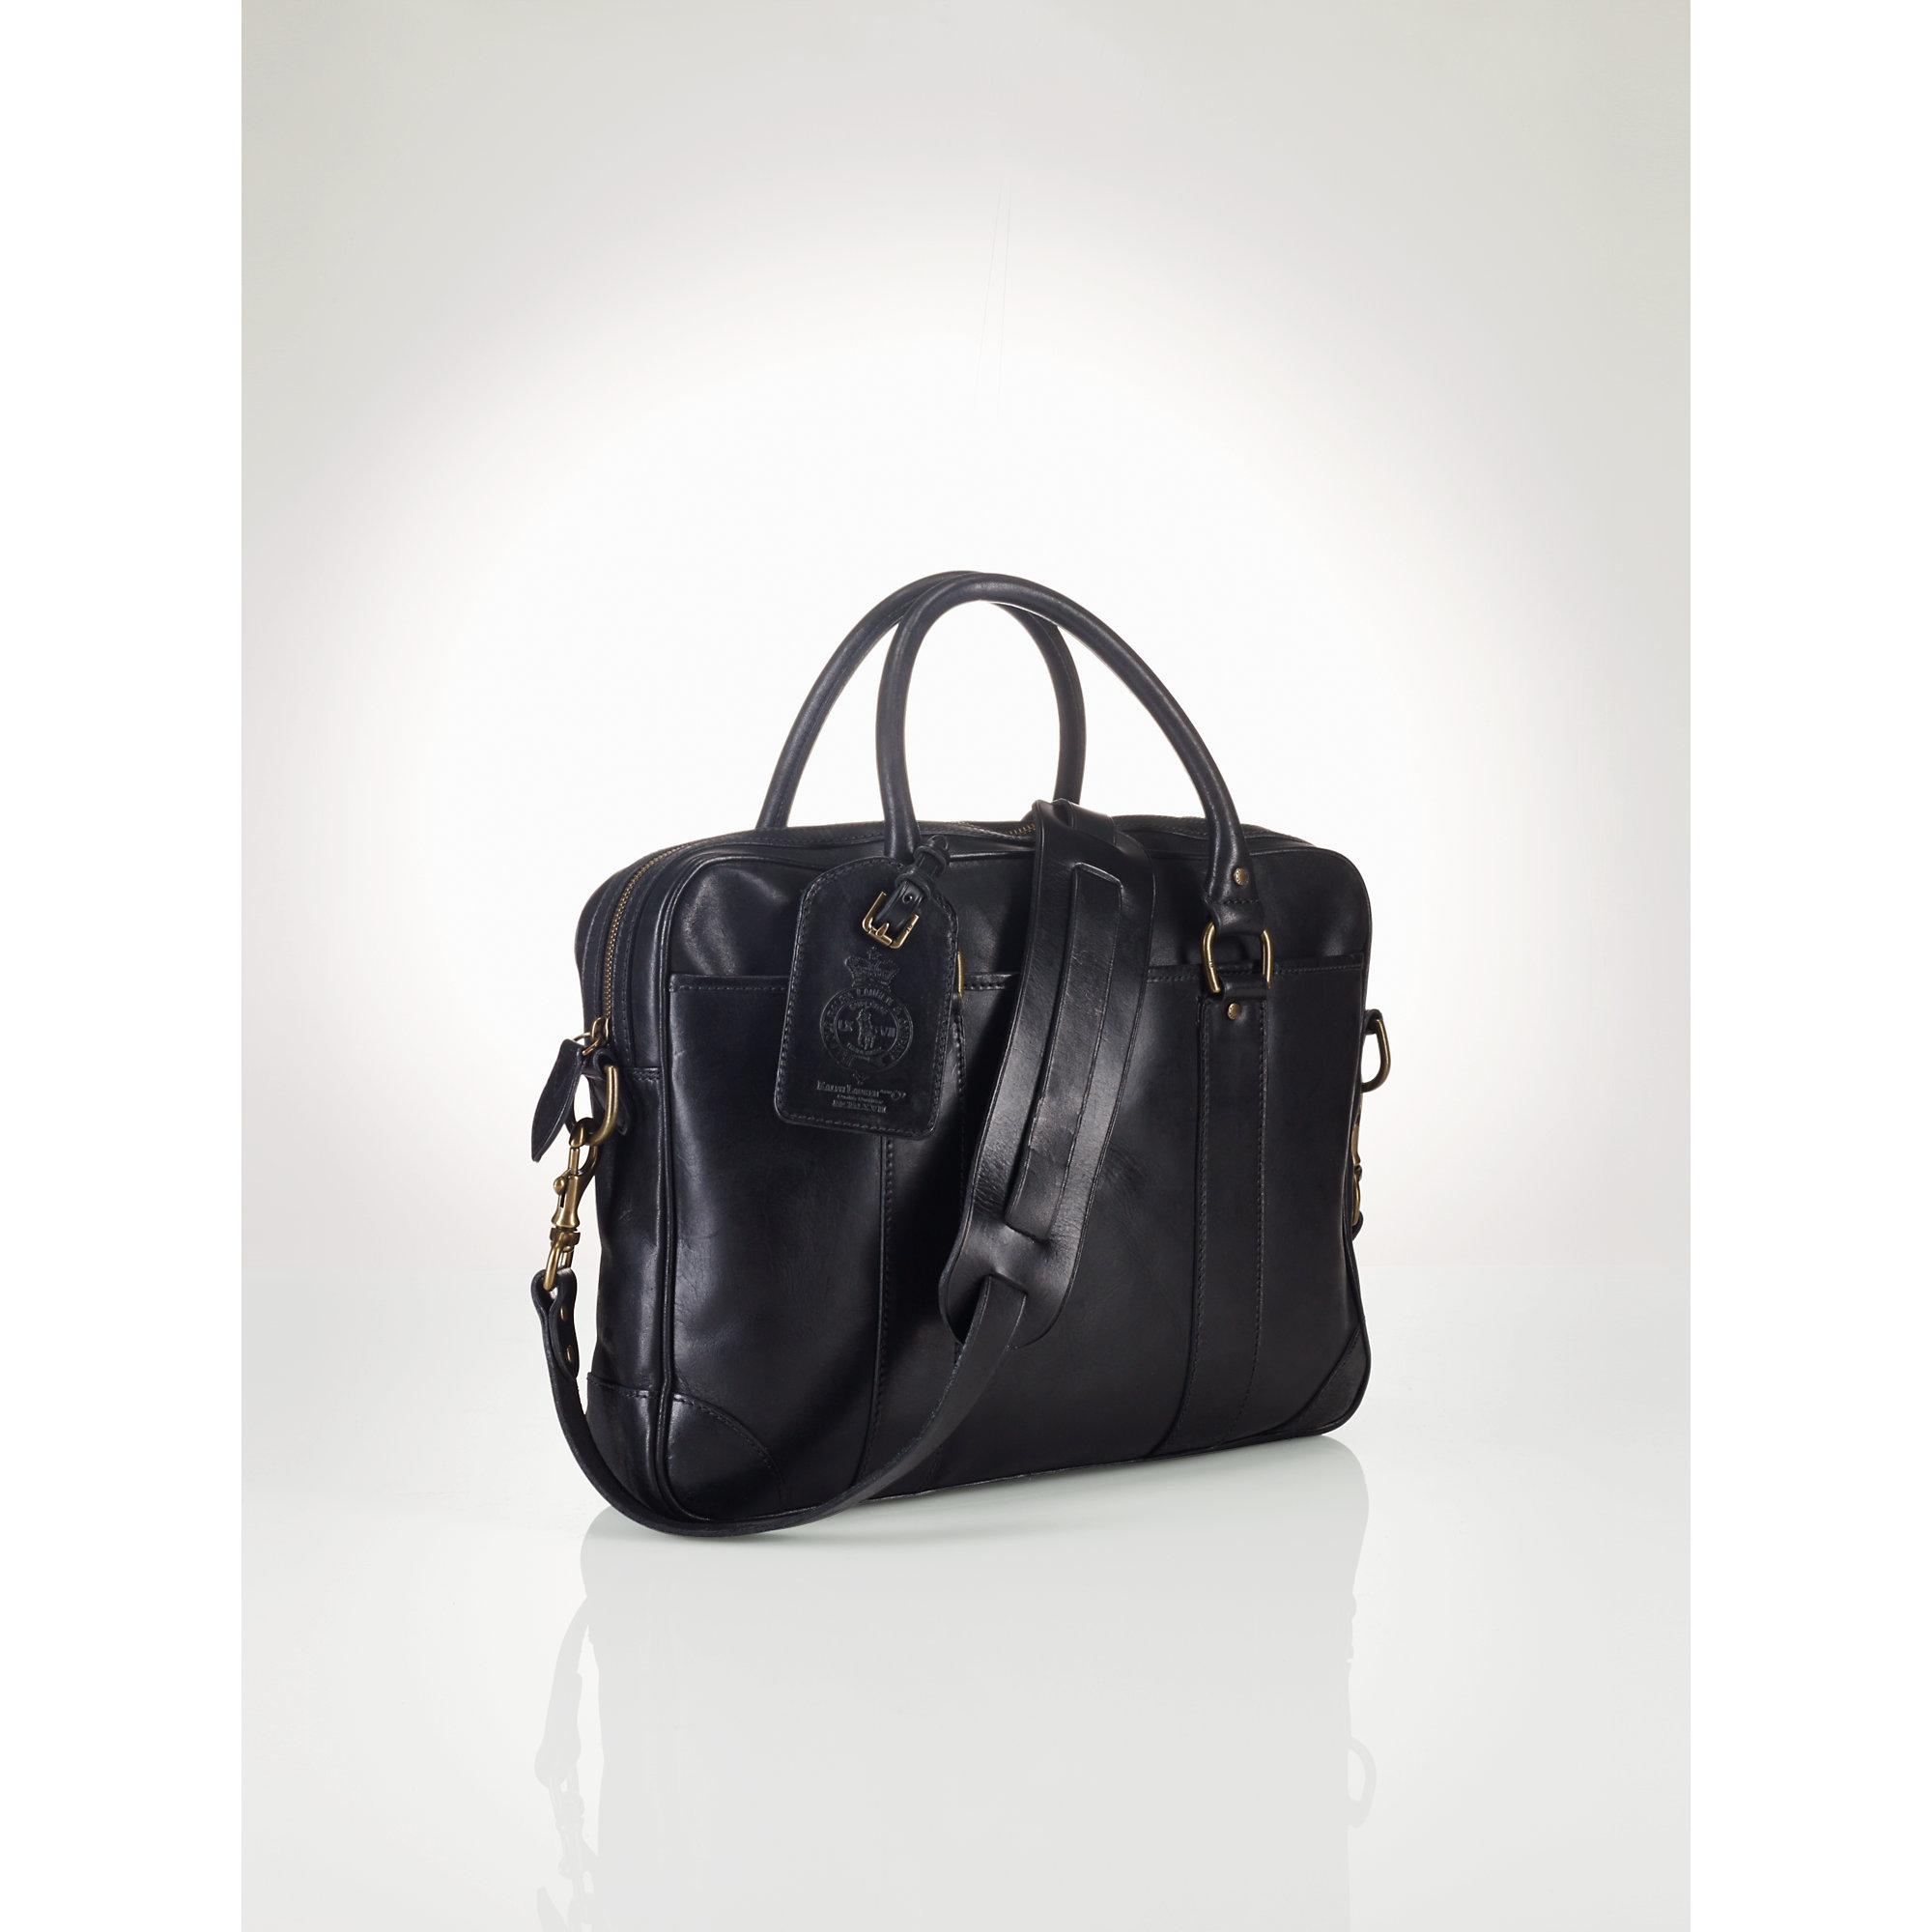 8167b15de159 Lyst - Polo Ralph Lauren Soft Leather Briefcase in Black for Men